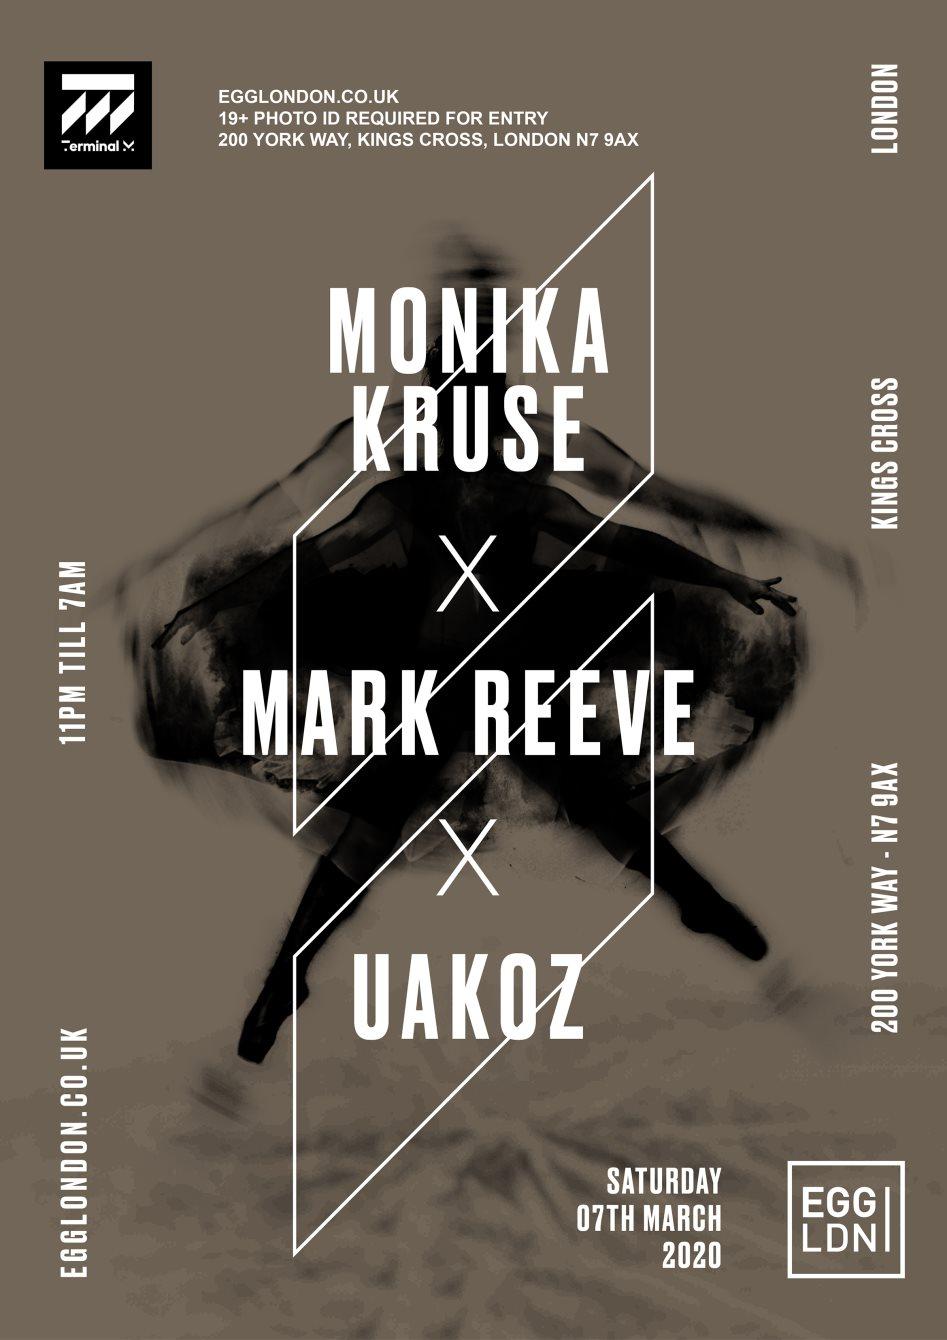 EGG LDN Pres: 20 Years of Terminal M - Monika Kruse, Uakoz, Mark Reeve - Flyer back